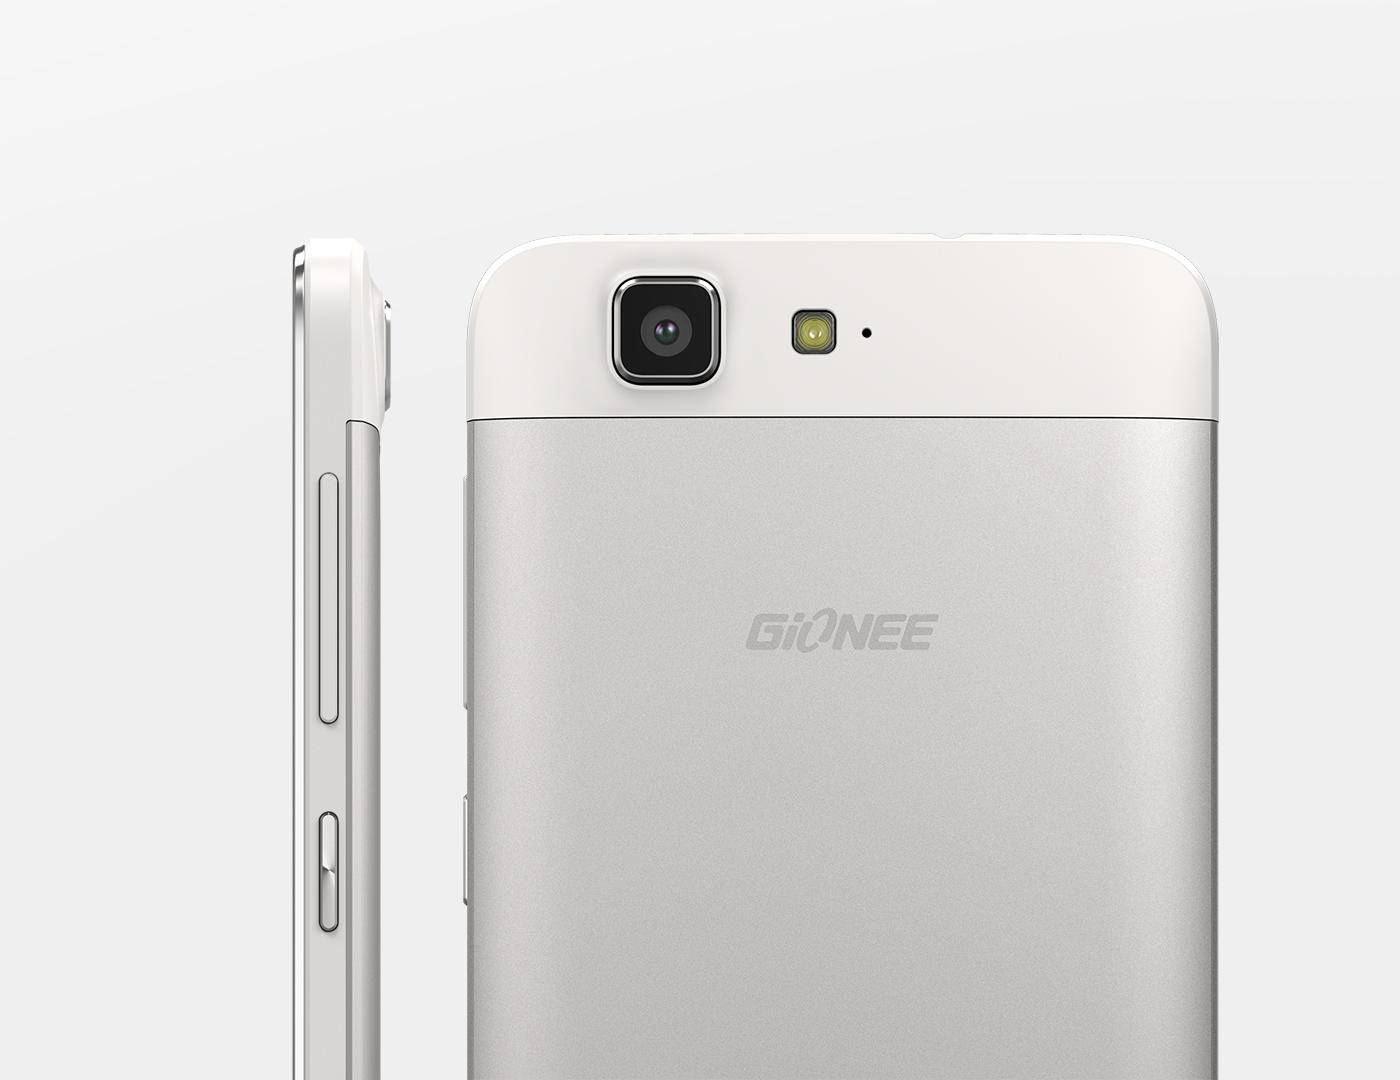 Smartphone Gionee F303 on Behance